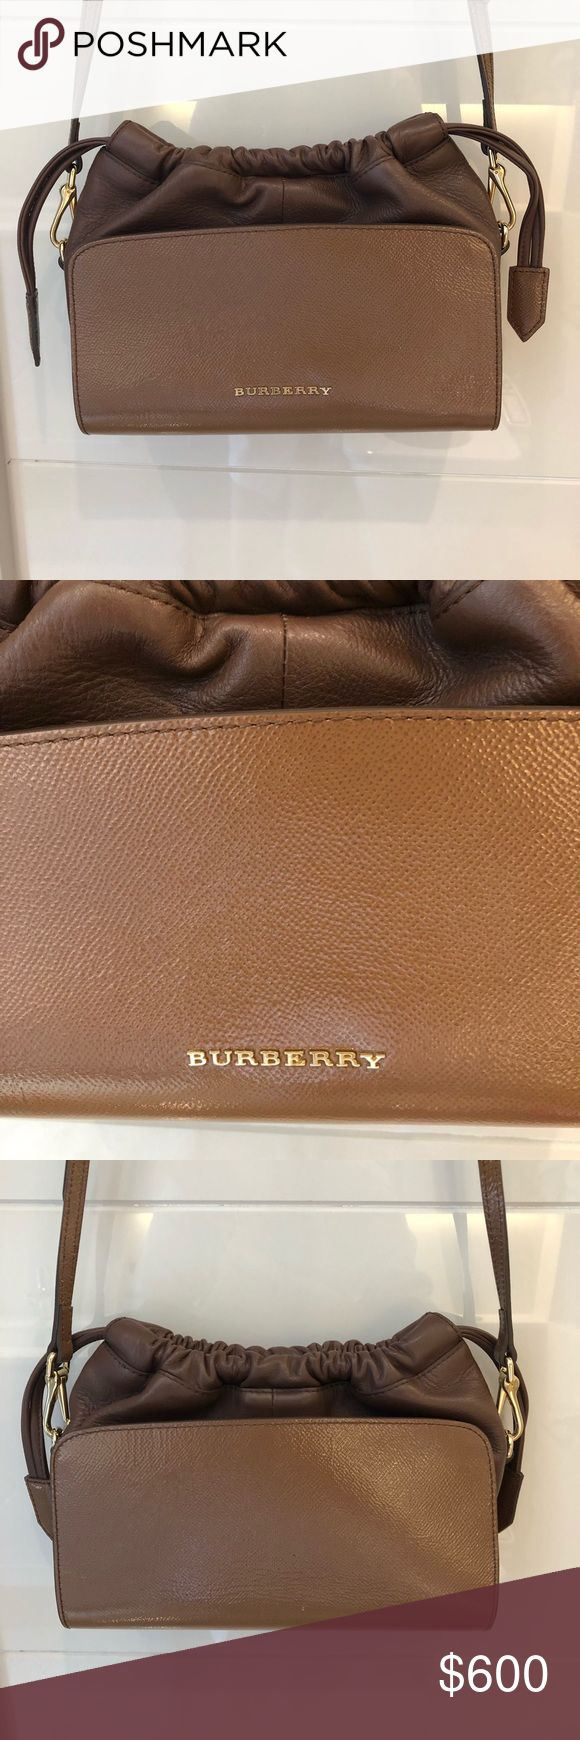 Burberry Crossbody Used